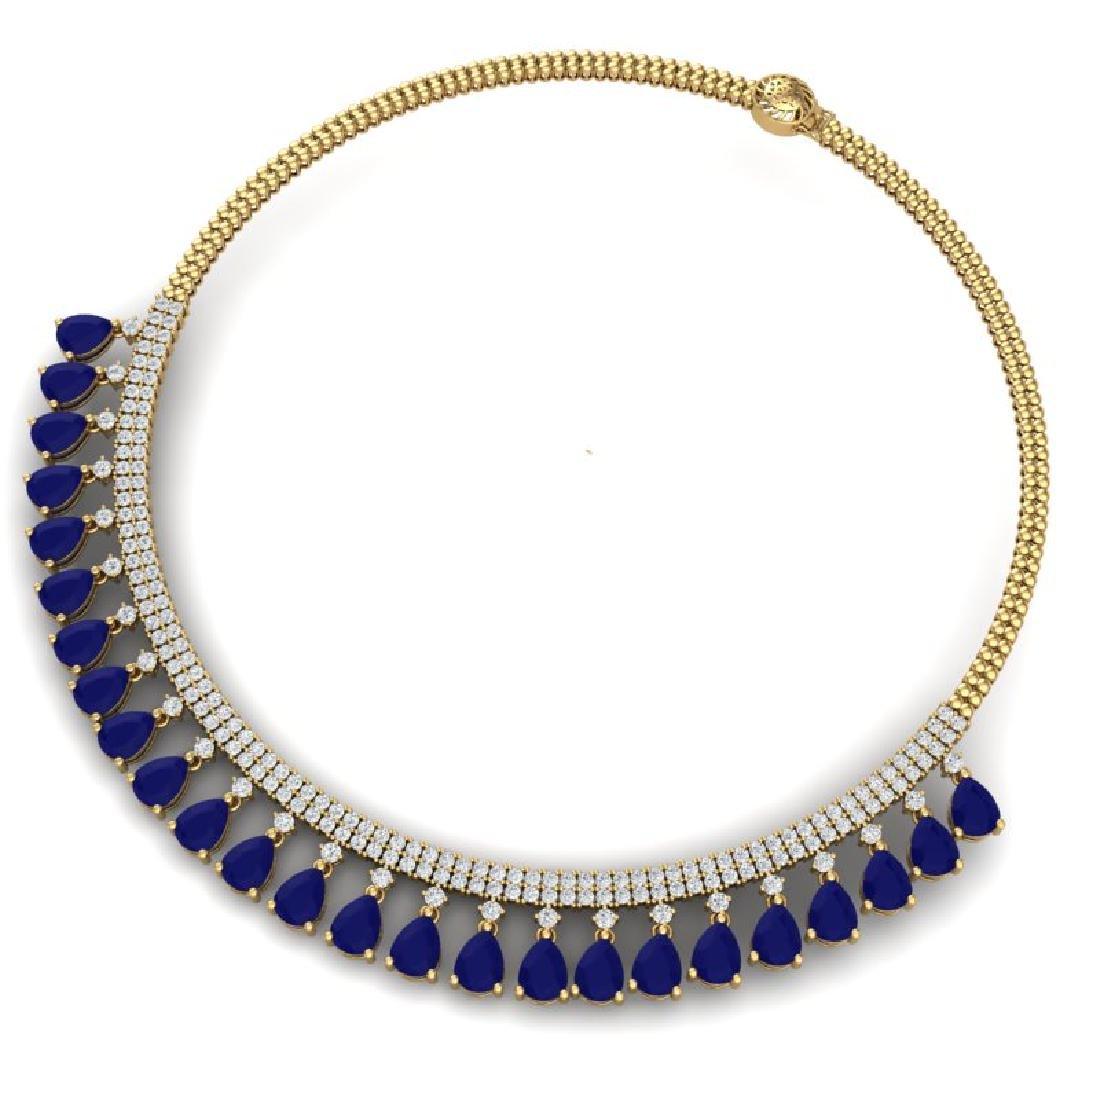 51.75 CTW Royalty Sapphire & VS Diamond Necklace 18K - 3